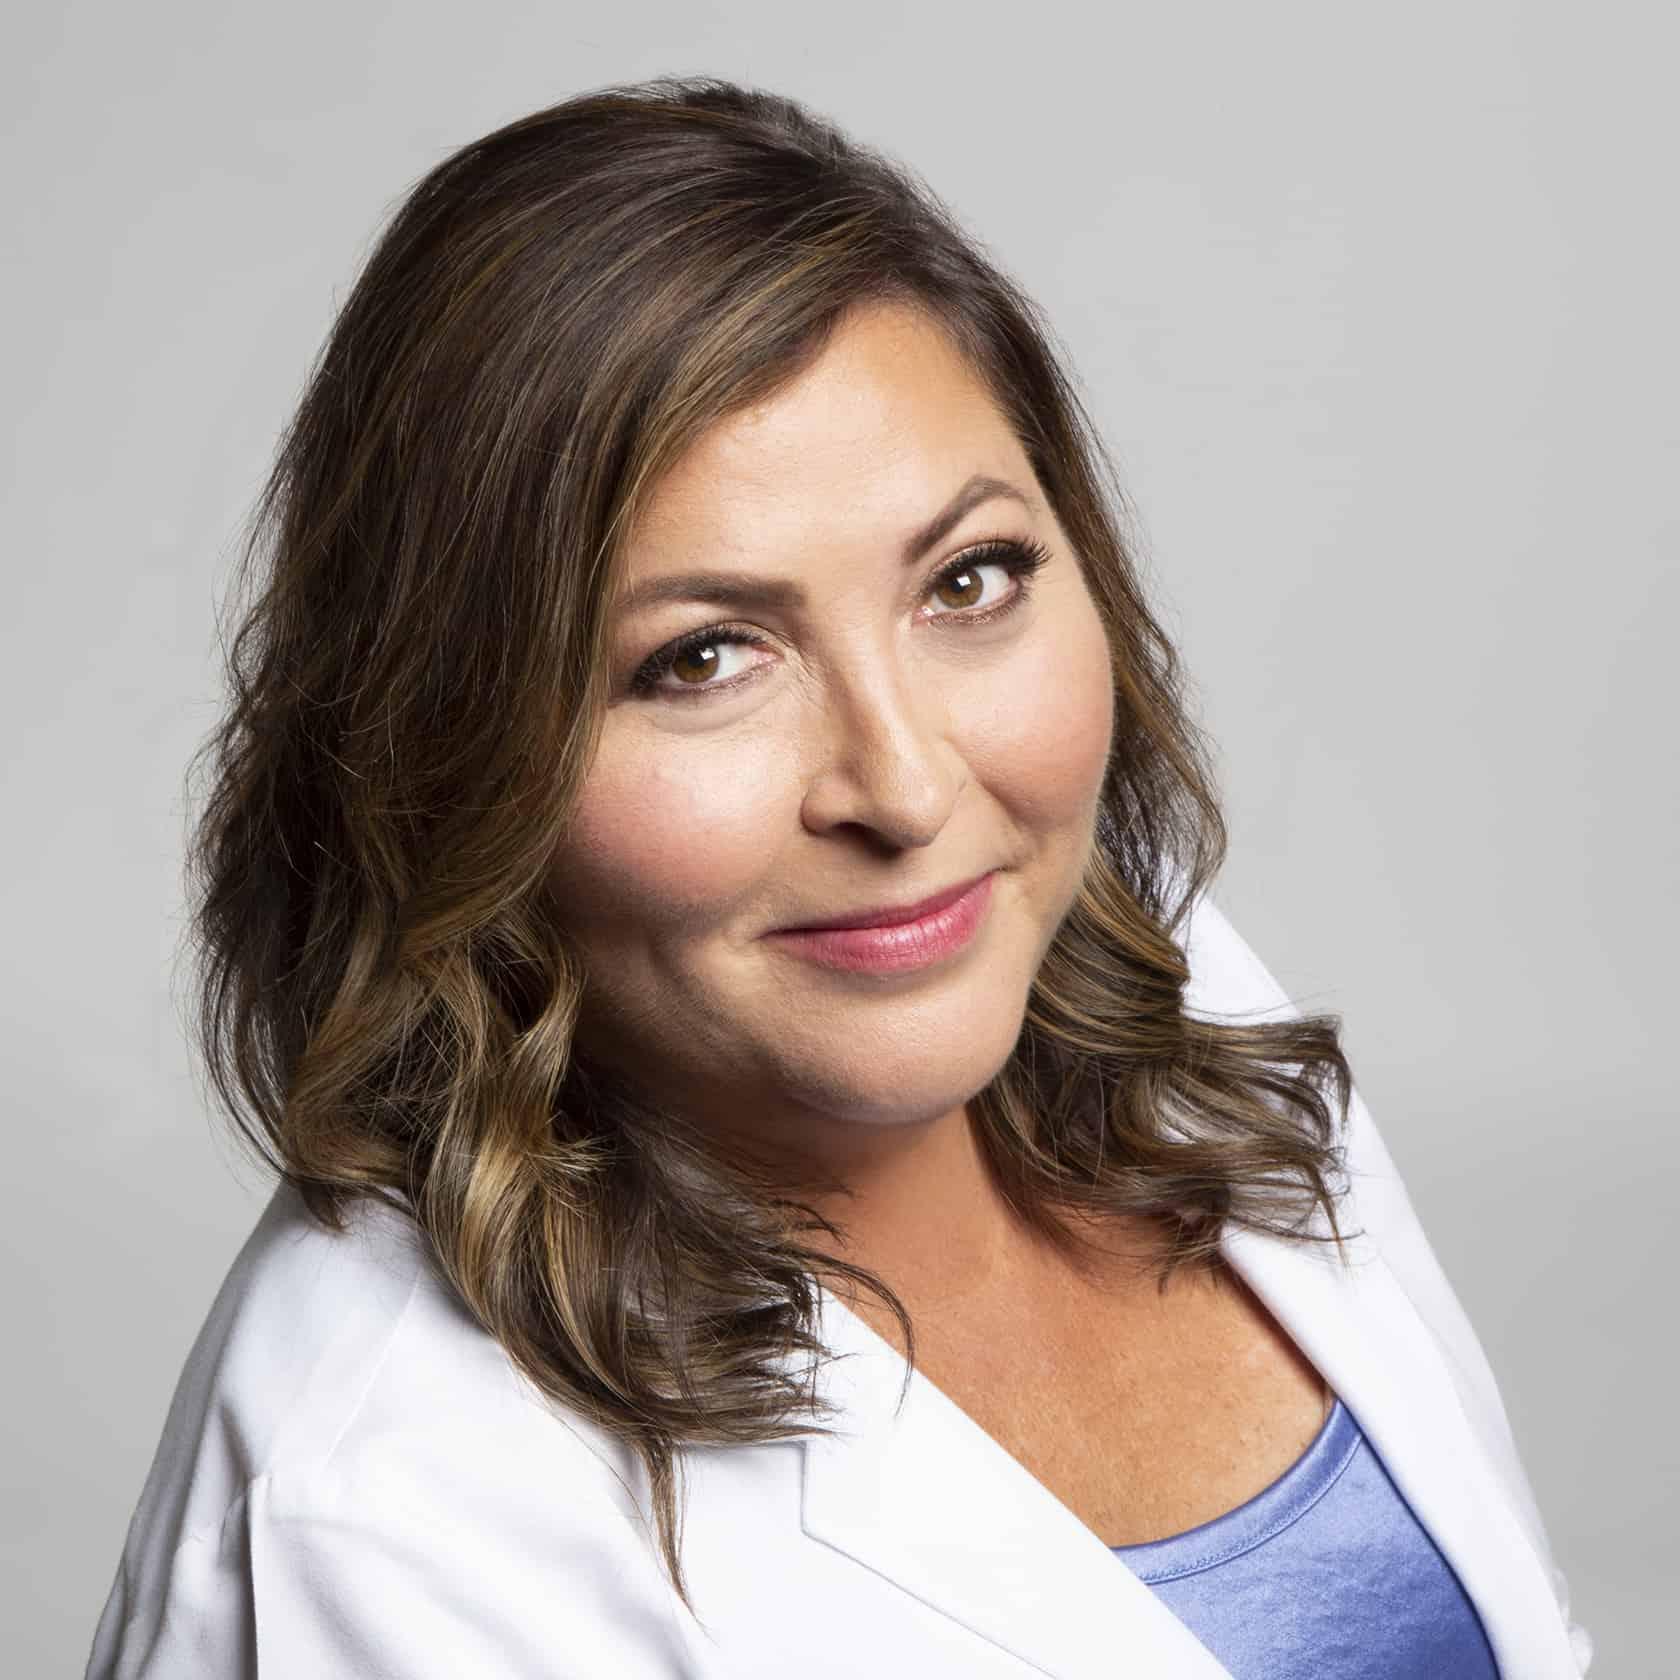 Atlanta Licensed Medical Esthetician Lauren Bays